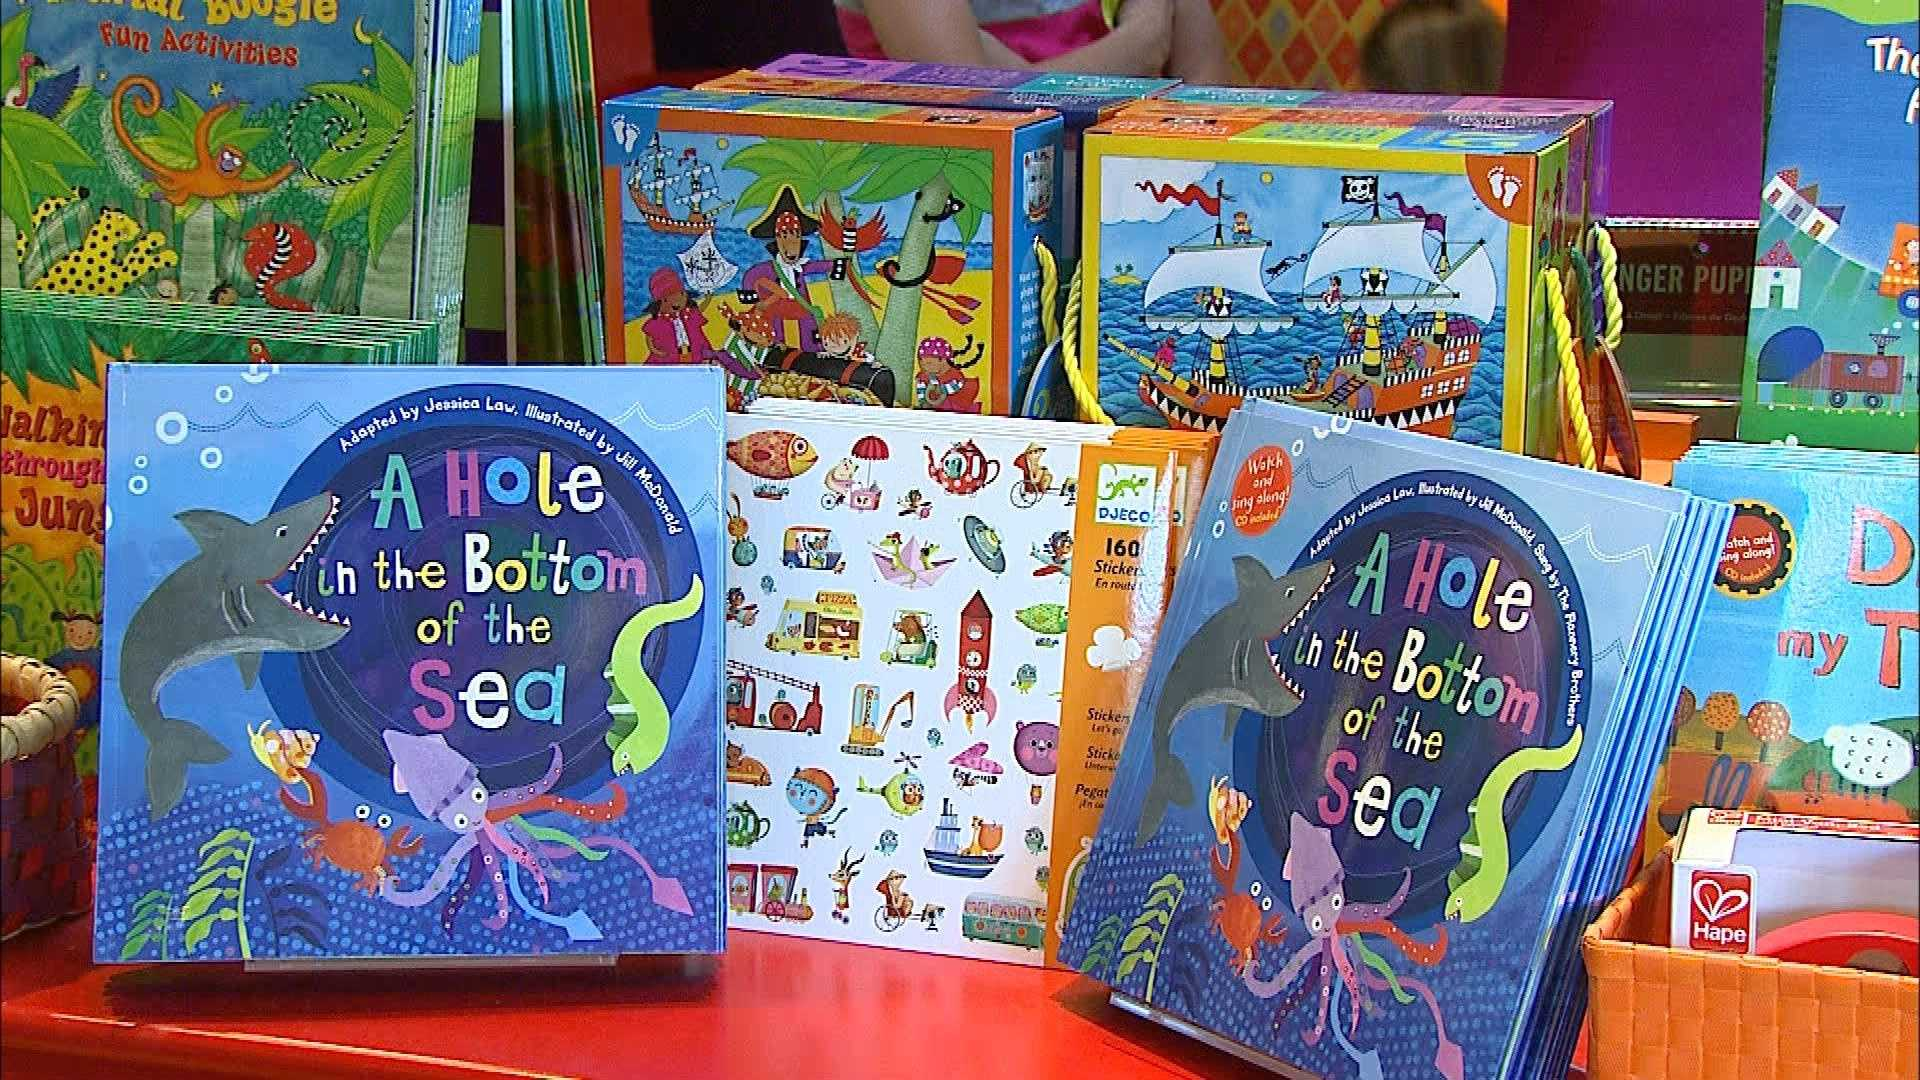 Image: Books